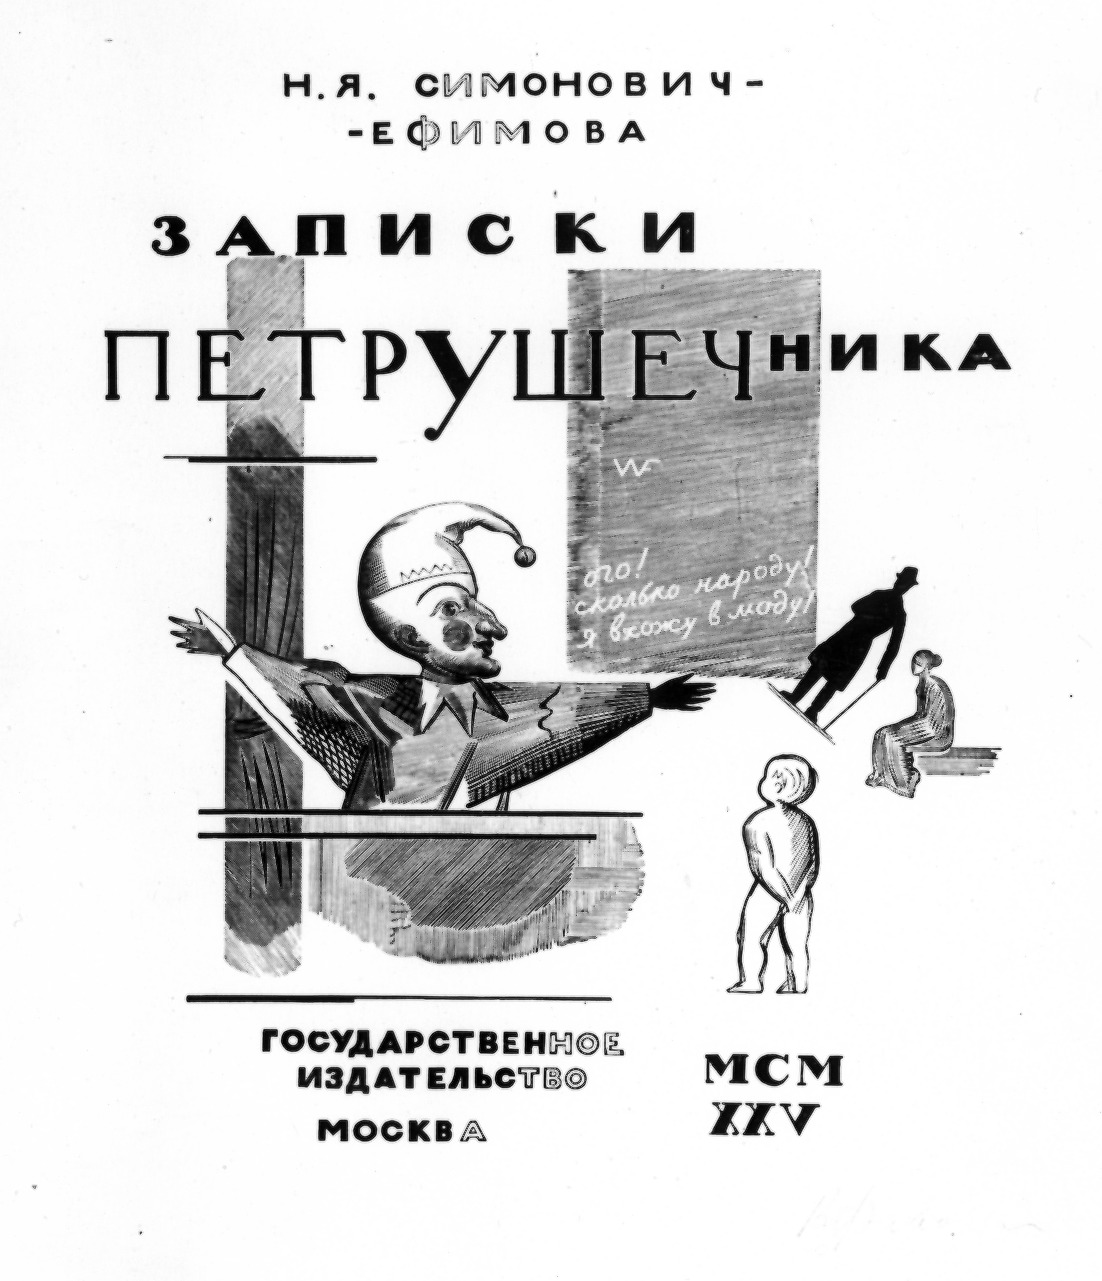 Couverture du livre de Nina Simonovitch-Efimova, <em>Zapiski petrushechnika</em> (Notes du marionnettiste de <em>Petrouchka</em>, Moscou, GIZ, 1925). Photo réproduite avec l'aimable autorisation de Collection : Gosudarstvenny akademichesky tsentralny teatr kukol imeni S. V. Obraztsova, Musée de la Marionnette (Moscou, Russie)